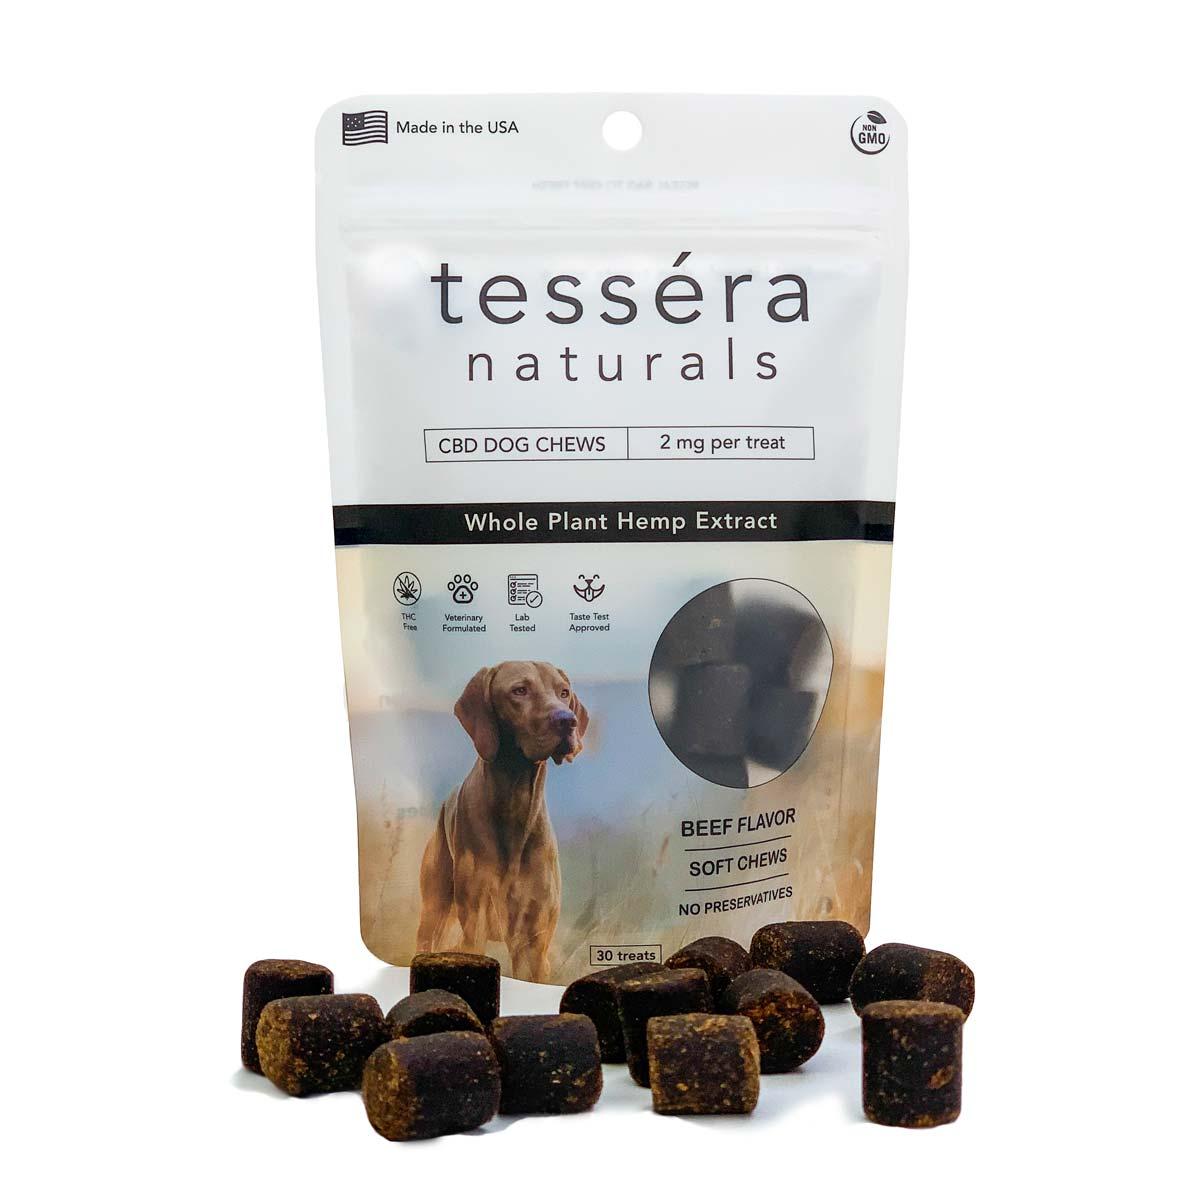 Buy Tessera Naturals CBD Tincture | CBD Pain Cream | CBD Salve | CBD Softgel Capsules | CBD Softgel Capsules | CBD Dog Treats